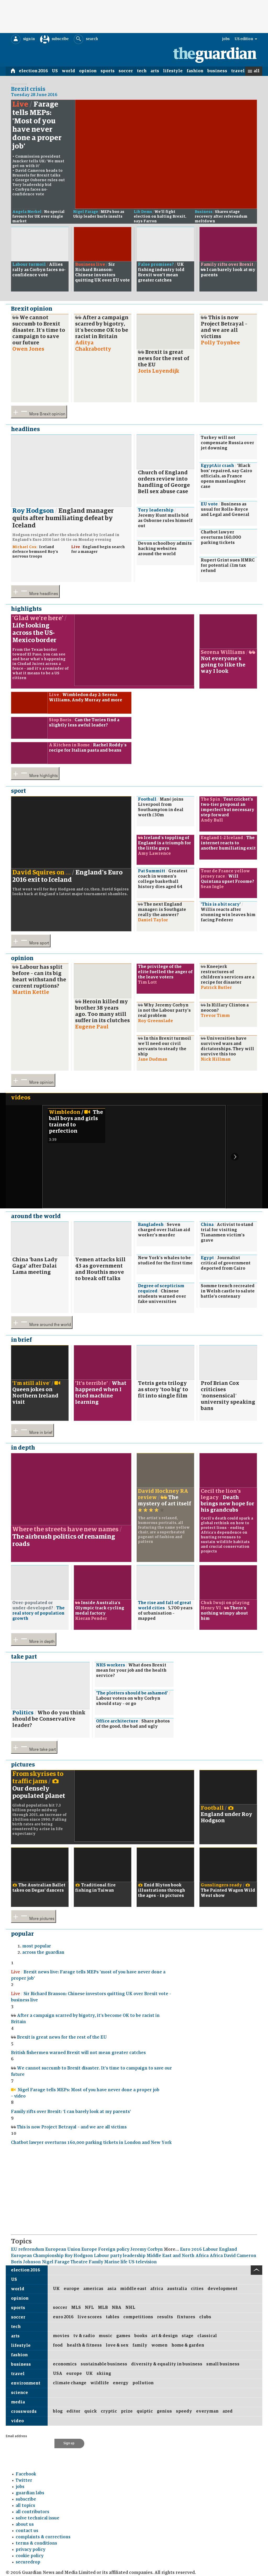 The Guardian at Tuesday June 28, 2016, 12:08 p.m. UTC